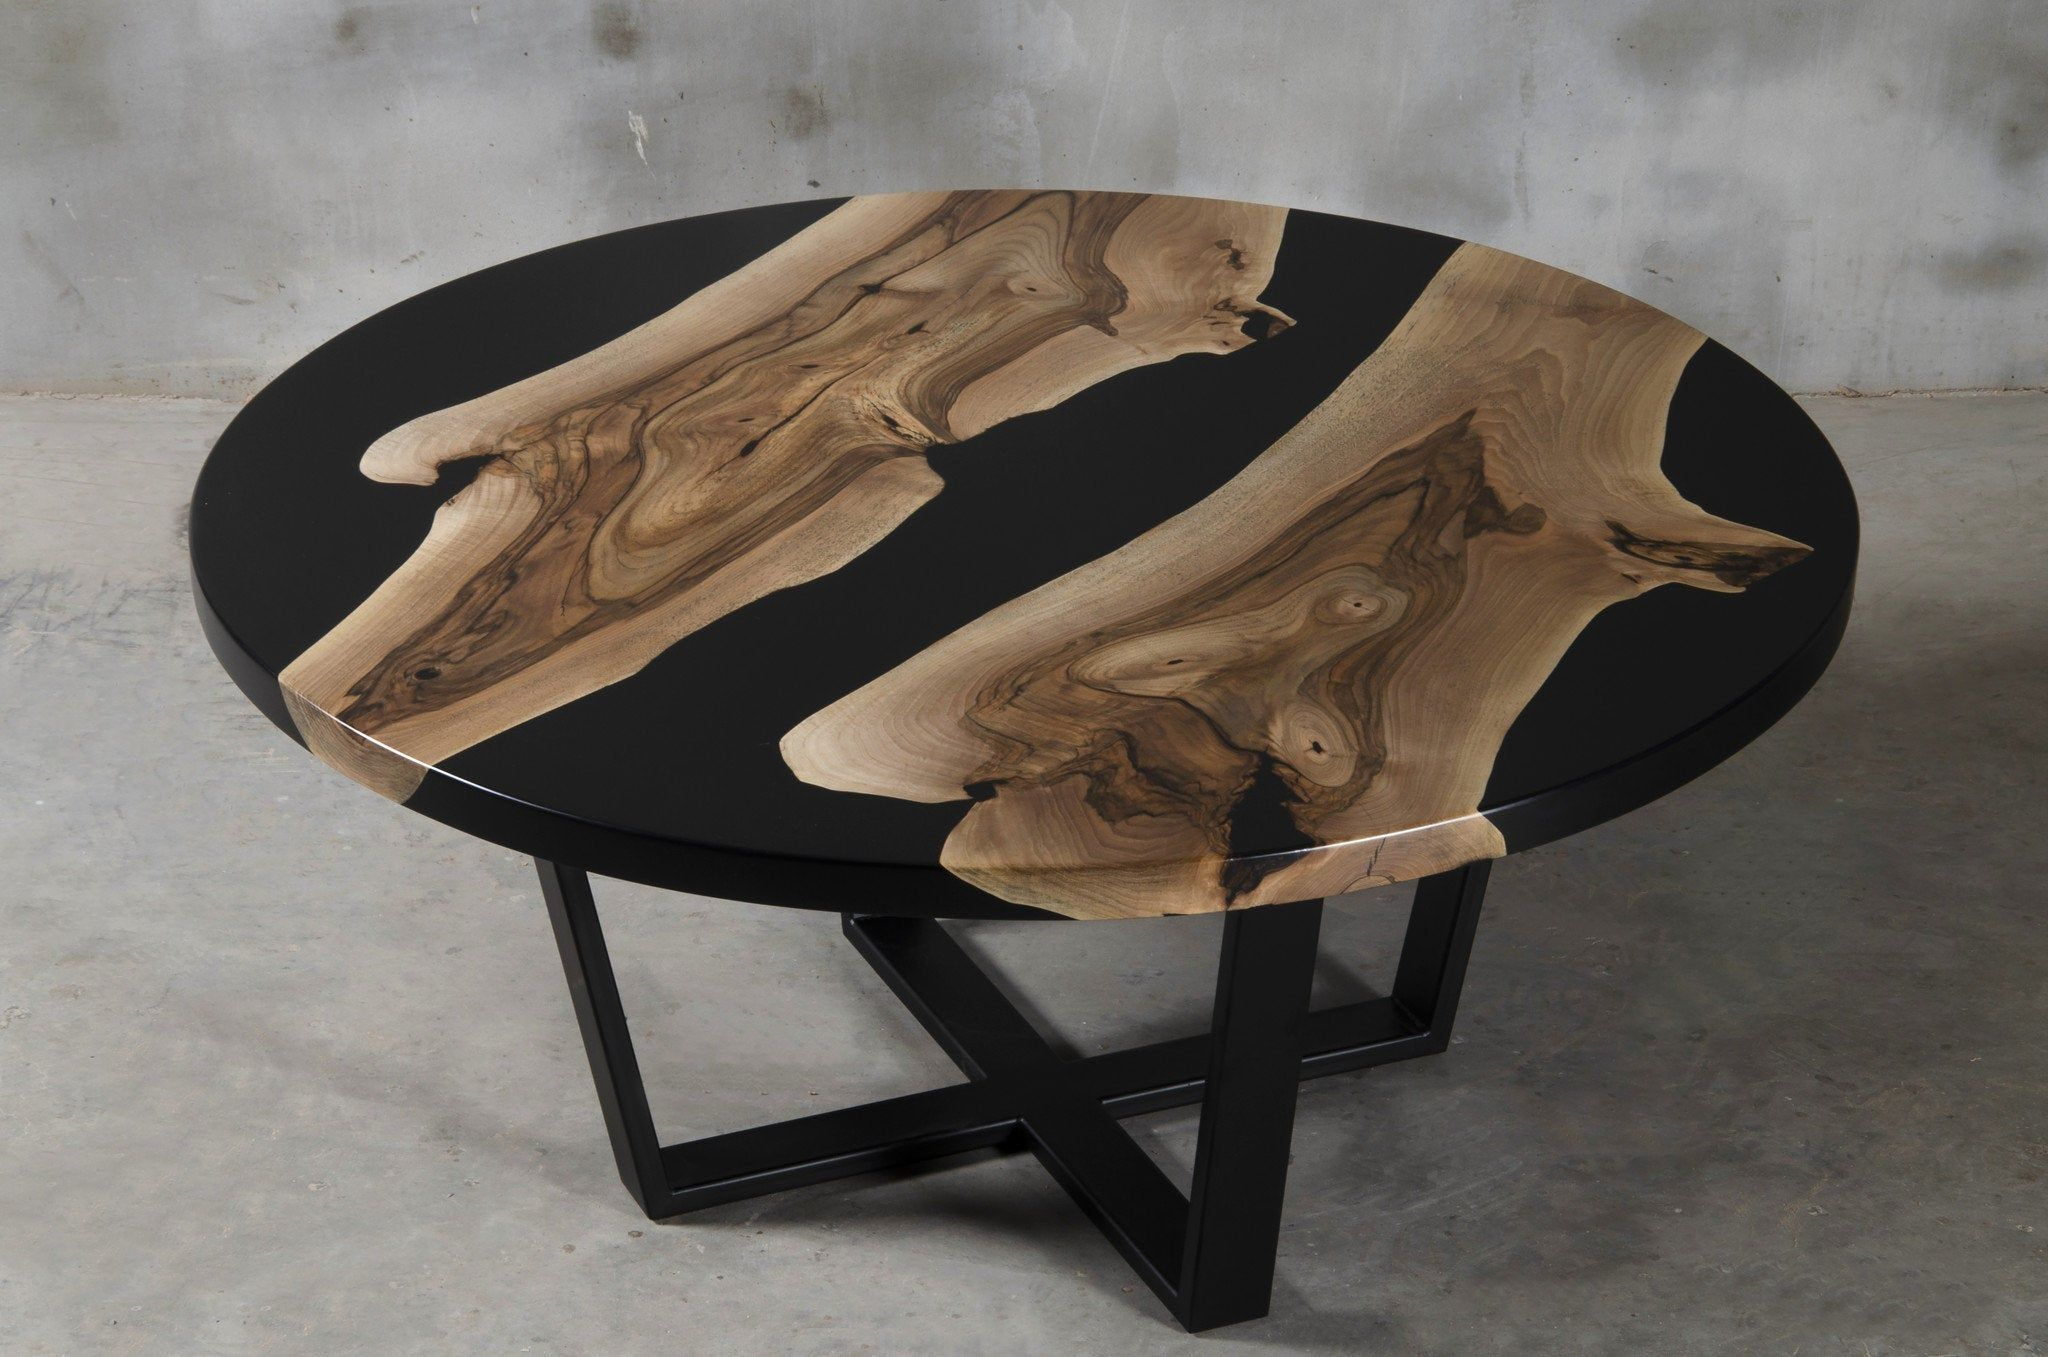 Custom Round Resin Table Made Of Walnut Black Epoxy Table Etsy Resin Table Walnut Coffee Table Modern Walnut Coffee Table [ 1357 x 2048 Pixel ]